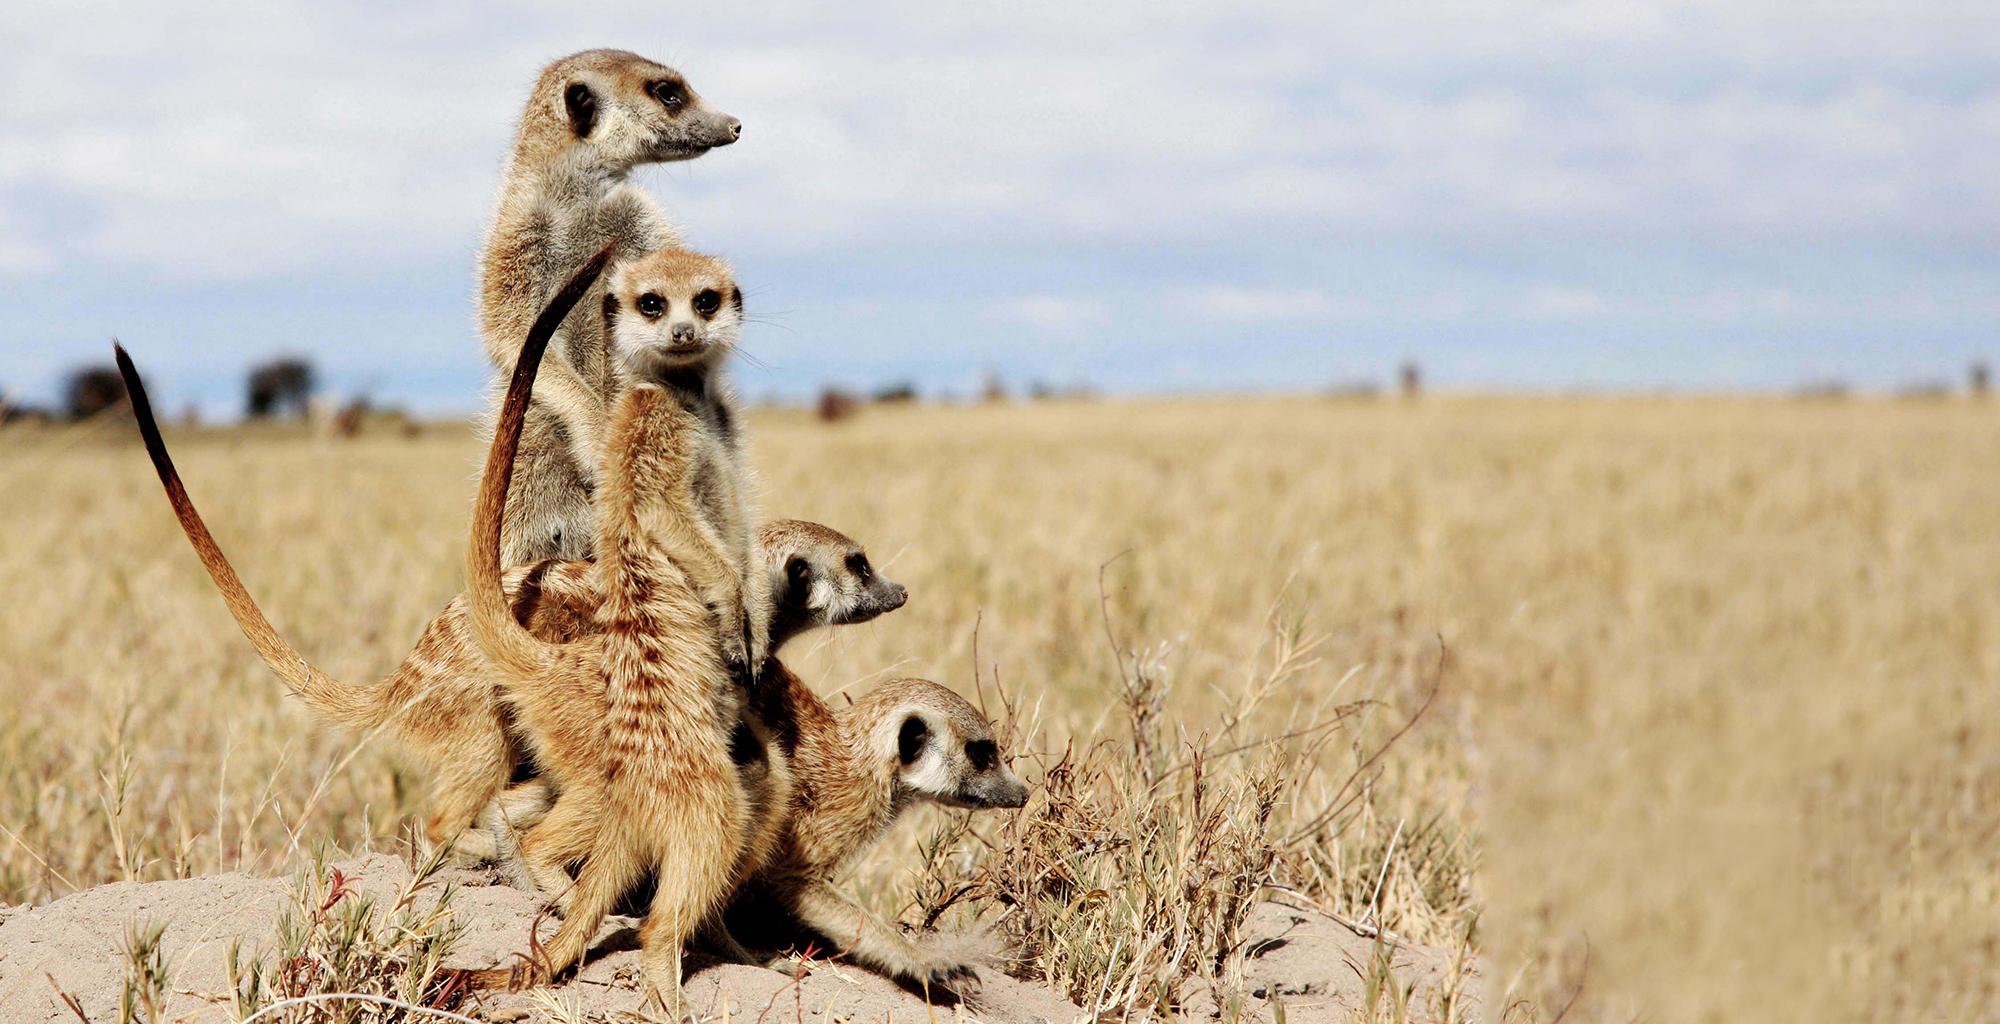 Botswana-Kalahari-Makgadikgadi-Pans-Wildlife-Meerkat